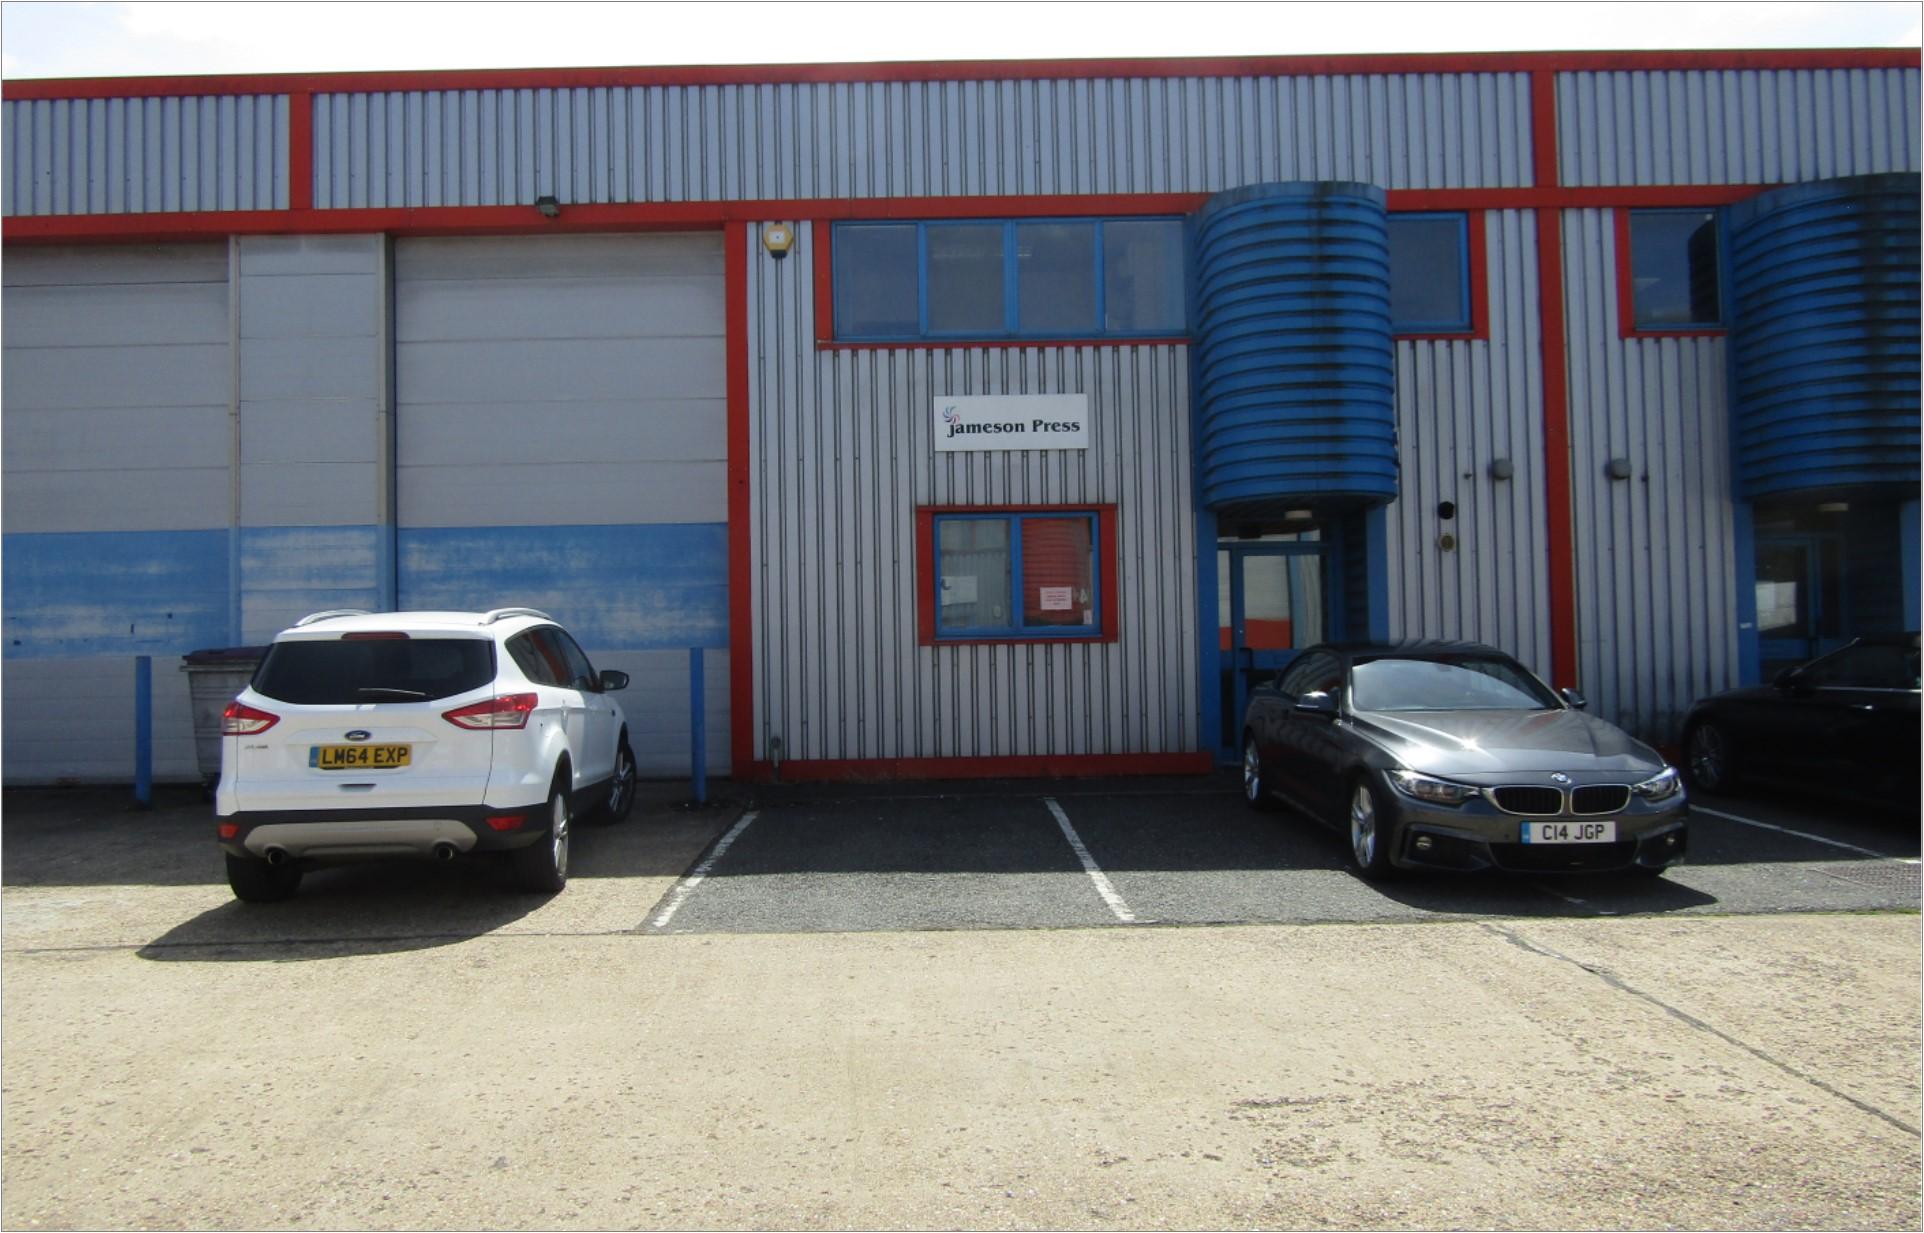 Unit 12, Mead Business Centre, Mead Lane, Hertford